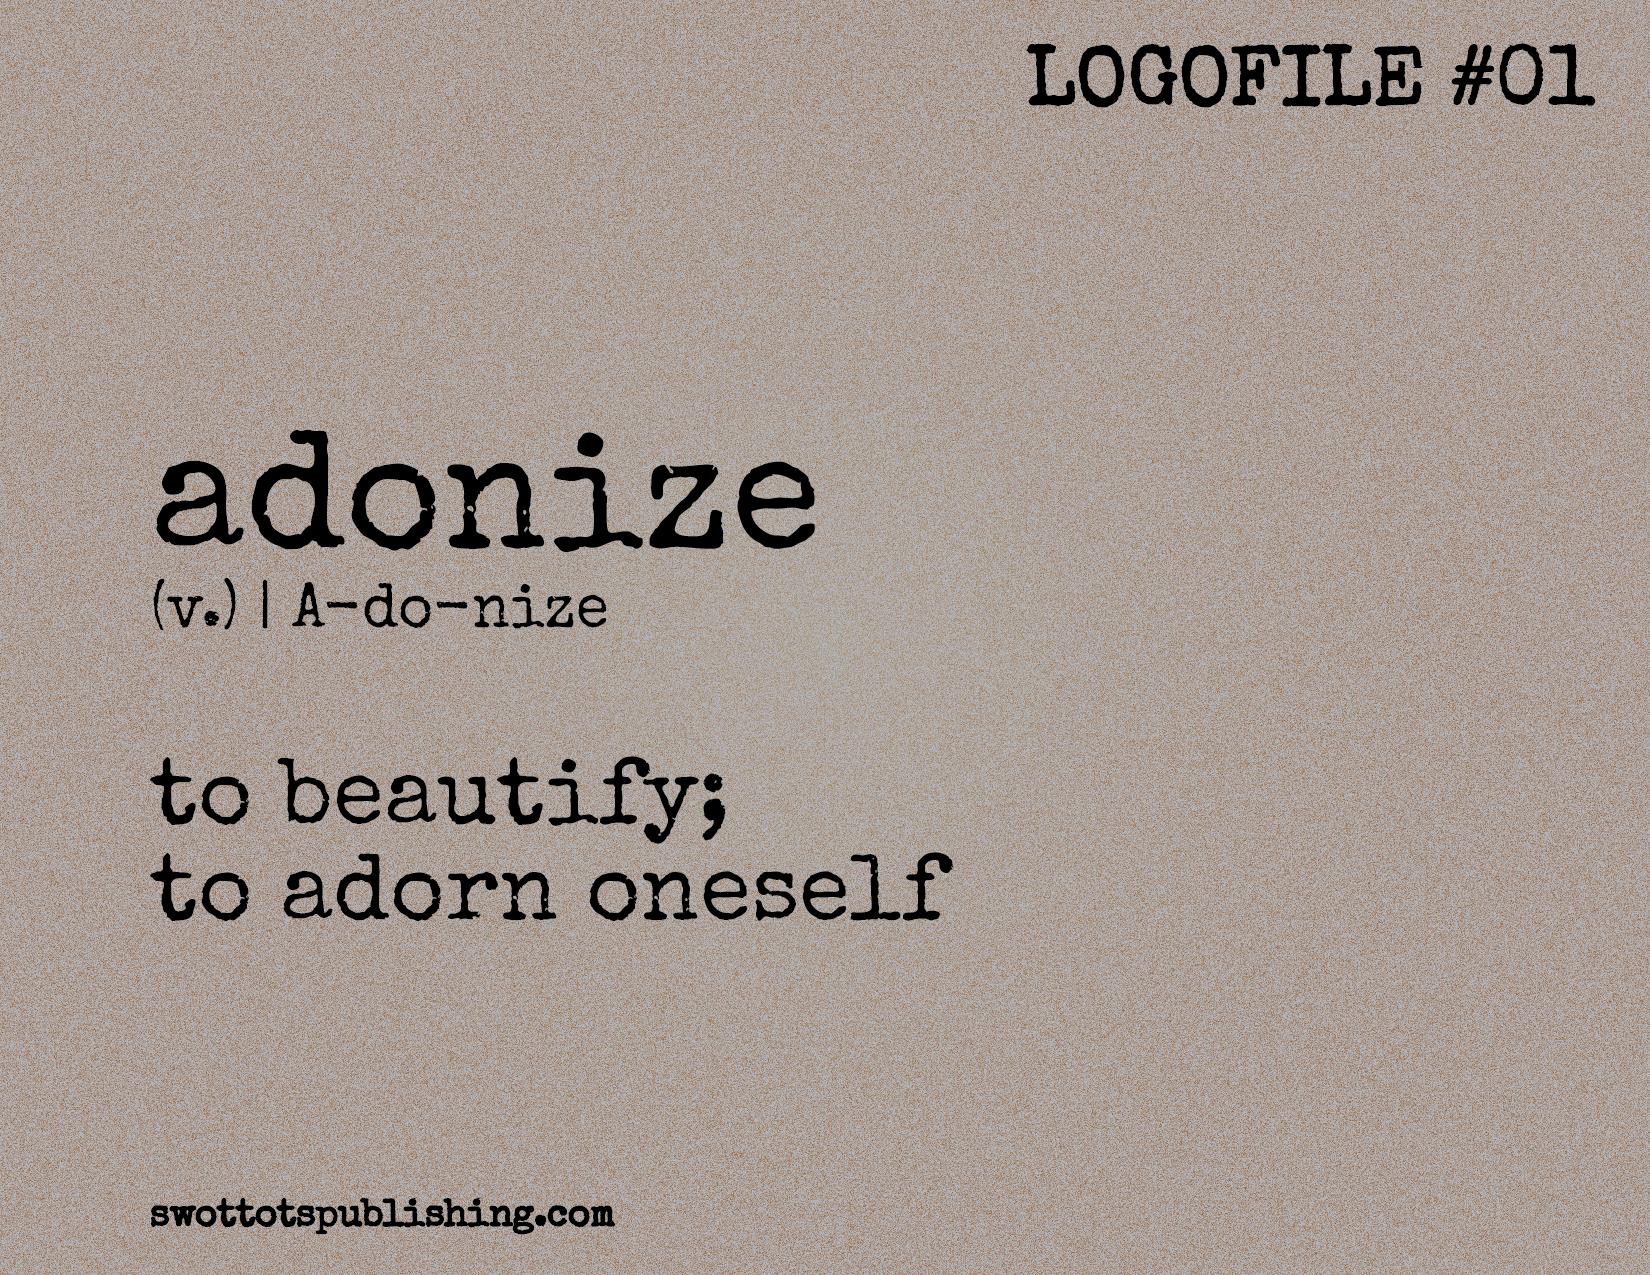 STP Logofile #01 | adonize (v.)